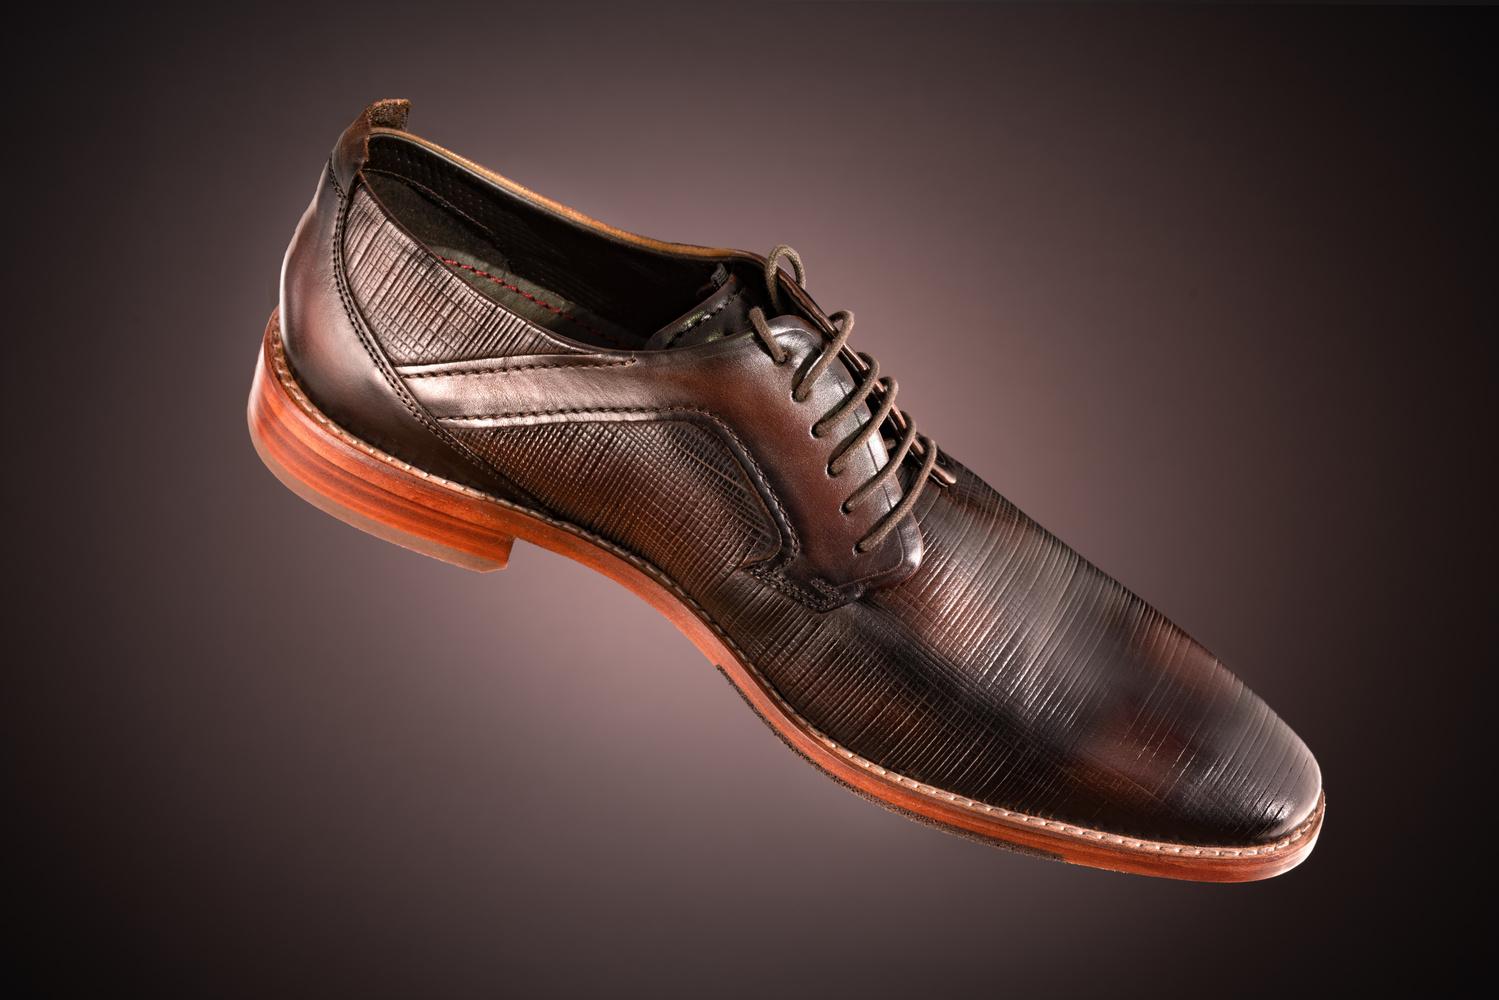 Shoe by Matthias Dietrich